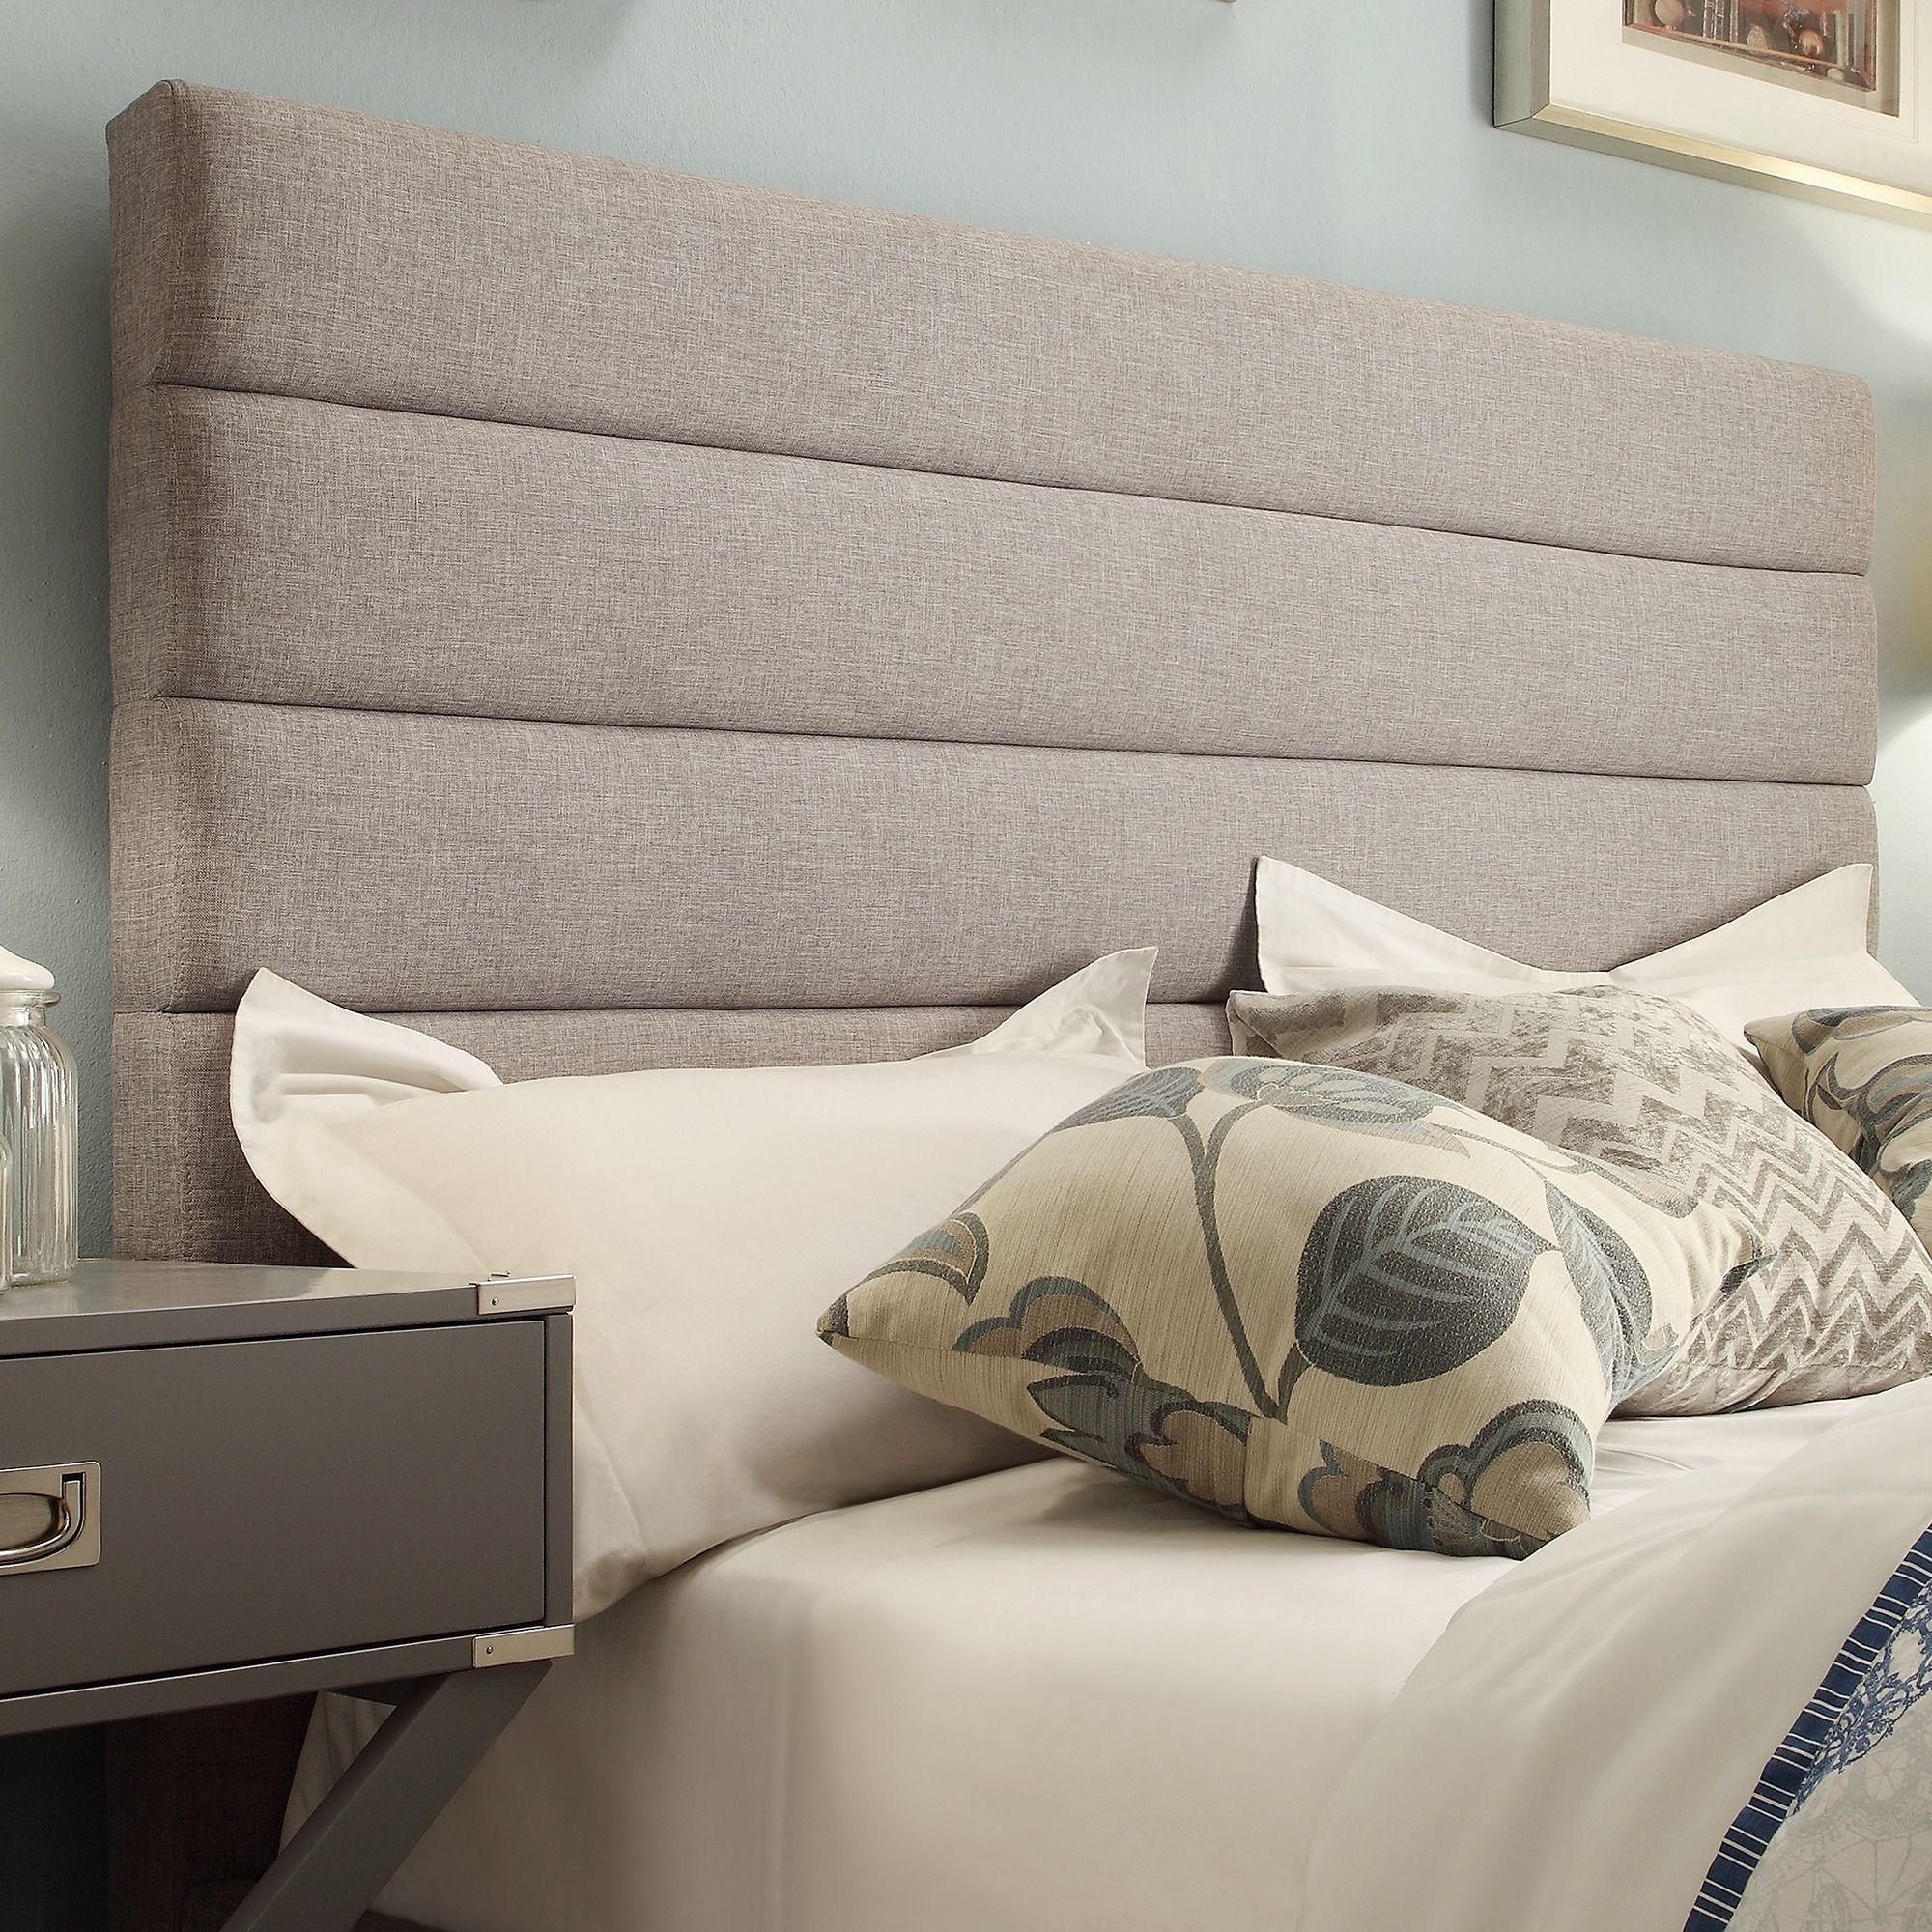 Corbett Horizontal Tufted Gray Linen Upholstered Headboard By